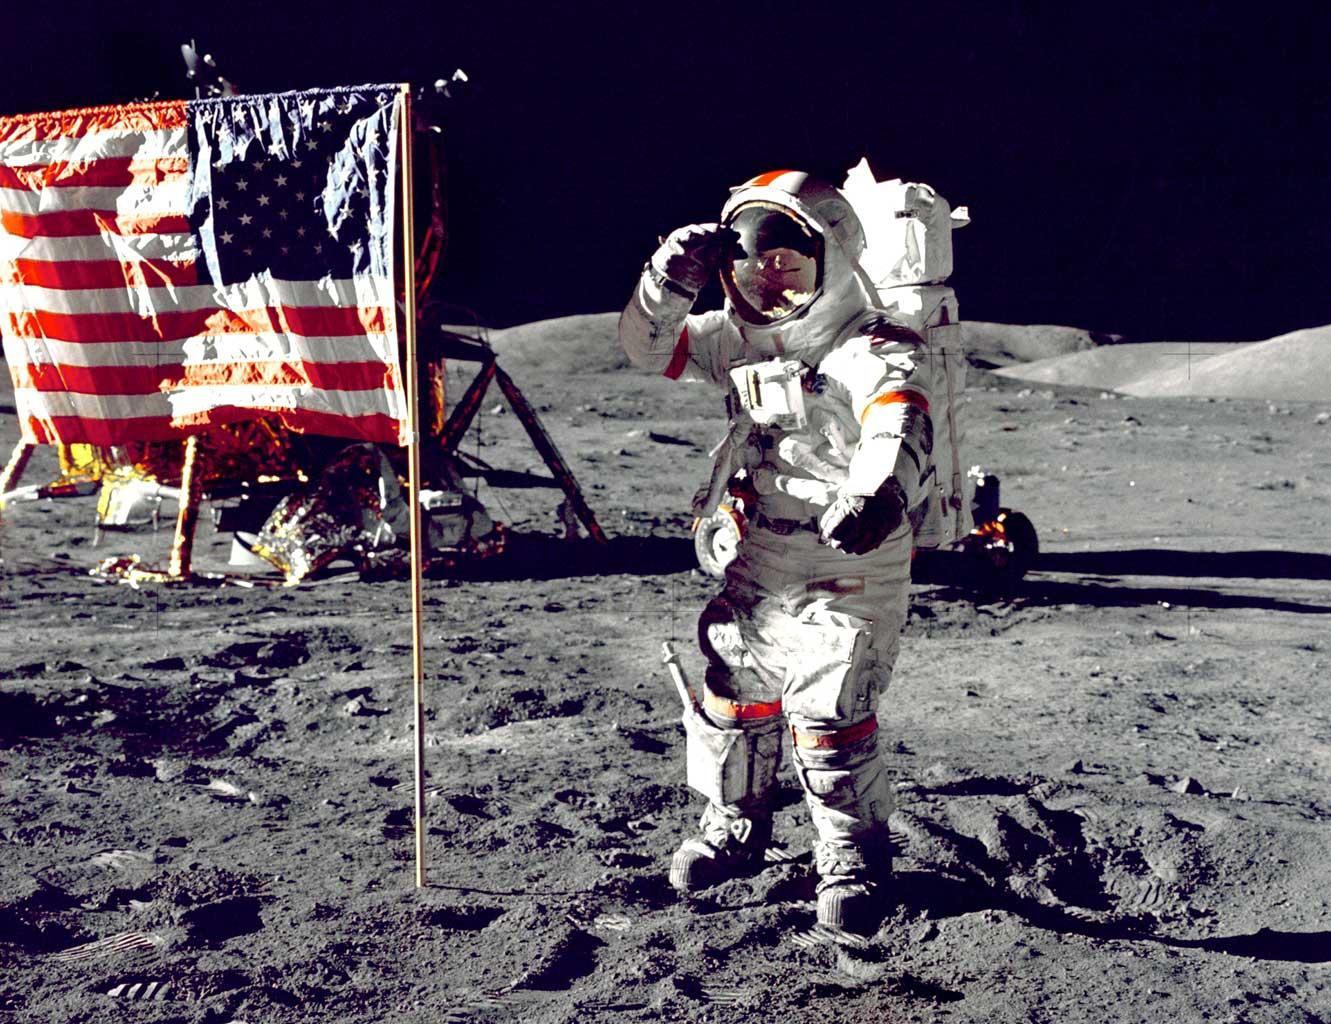 Eugene Cernan pozdravlja zastavu (Credit: NASA)